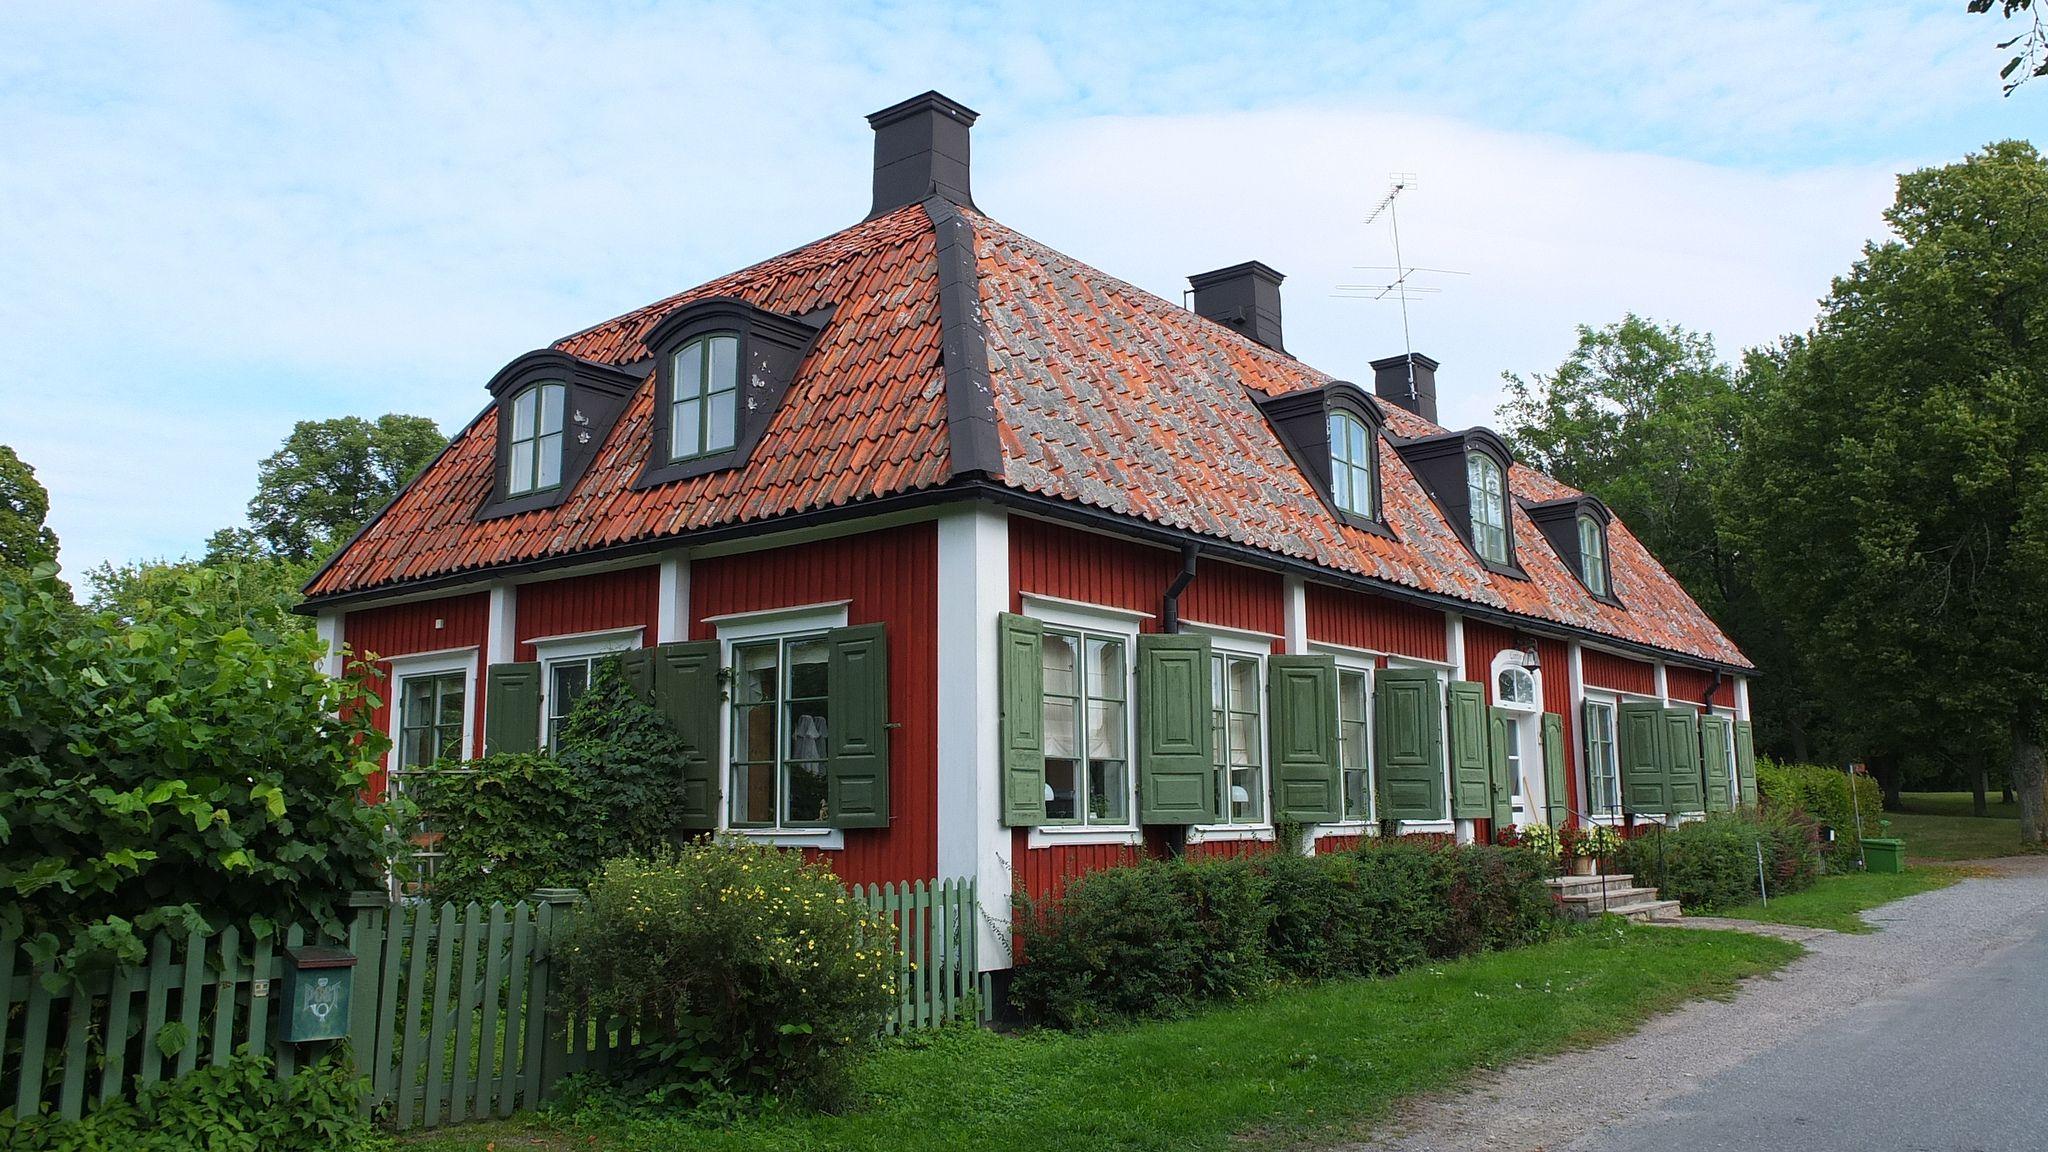 Canton Village, Chinese Pavilion, Kina Slott, Drottingholm Palace, Drottningholms slott, Sweden